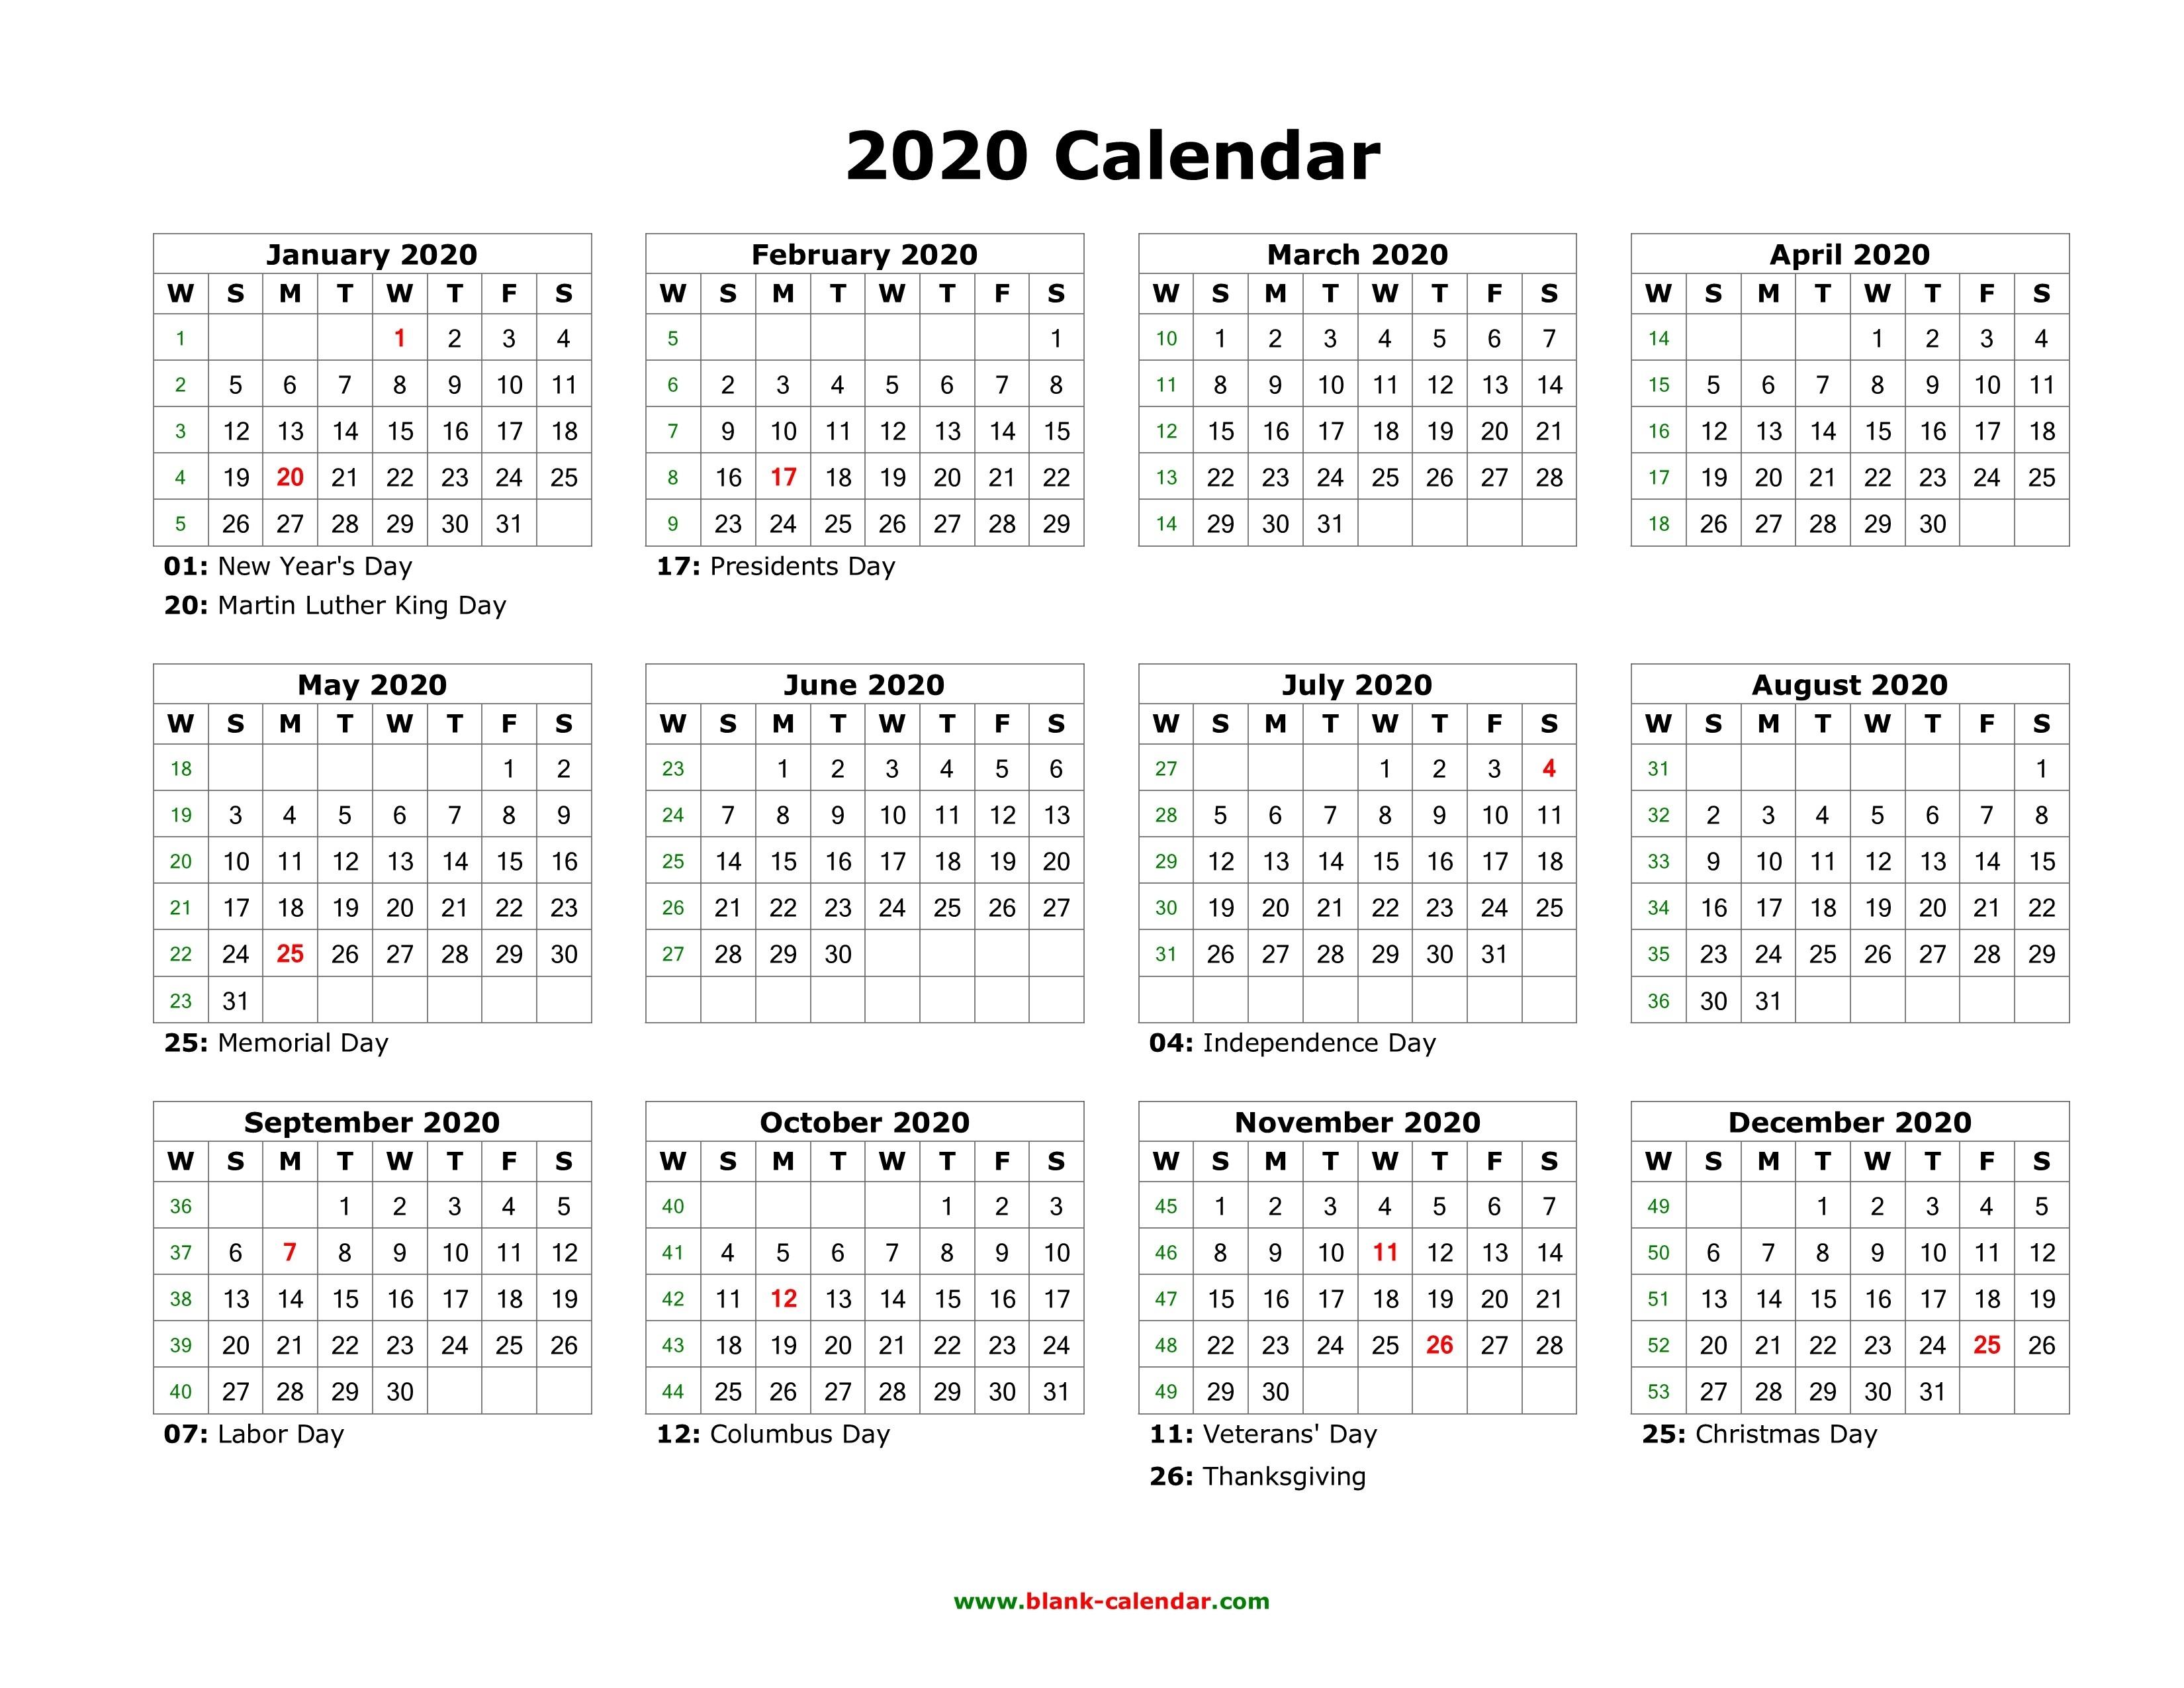 Blank Calendar 2020 | Free Download Calendar Templates-2020 Printable Calendar Templates Free